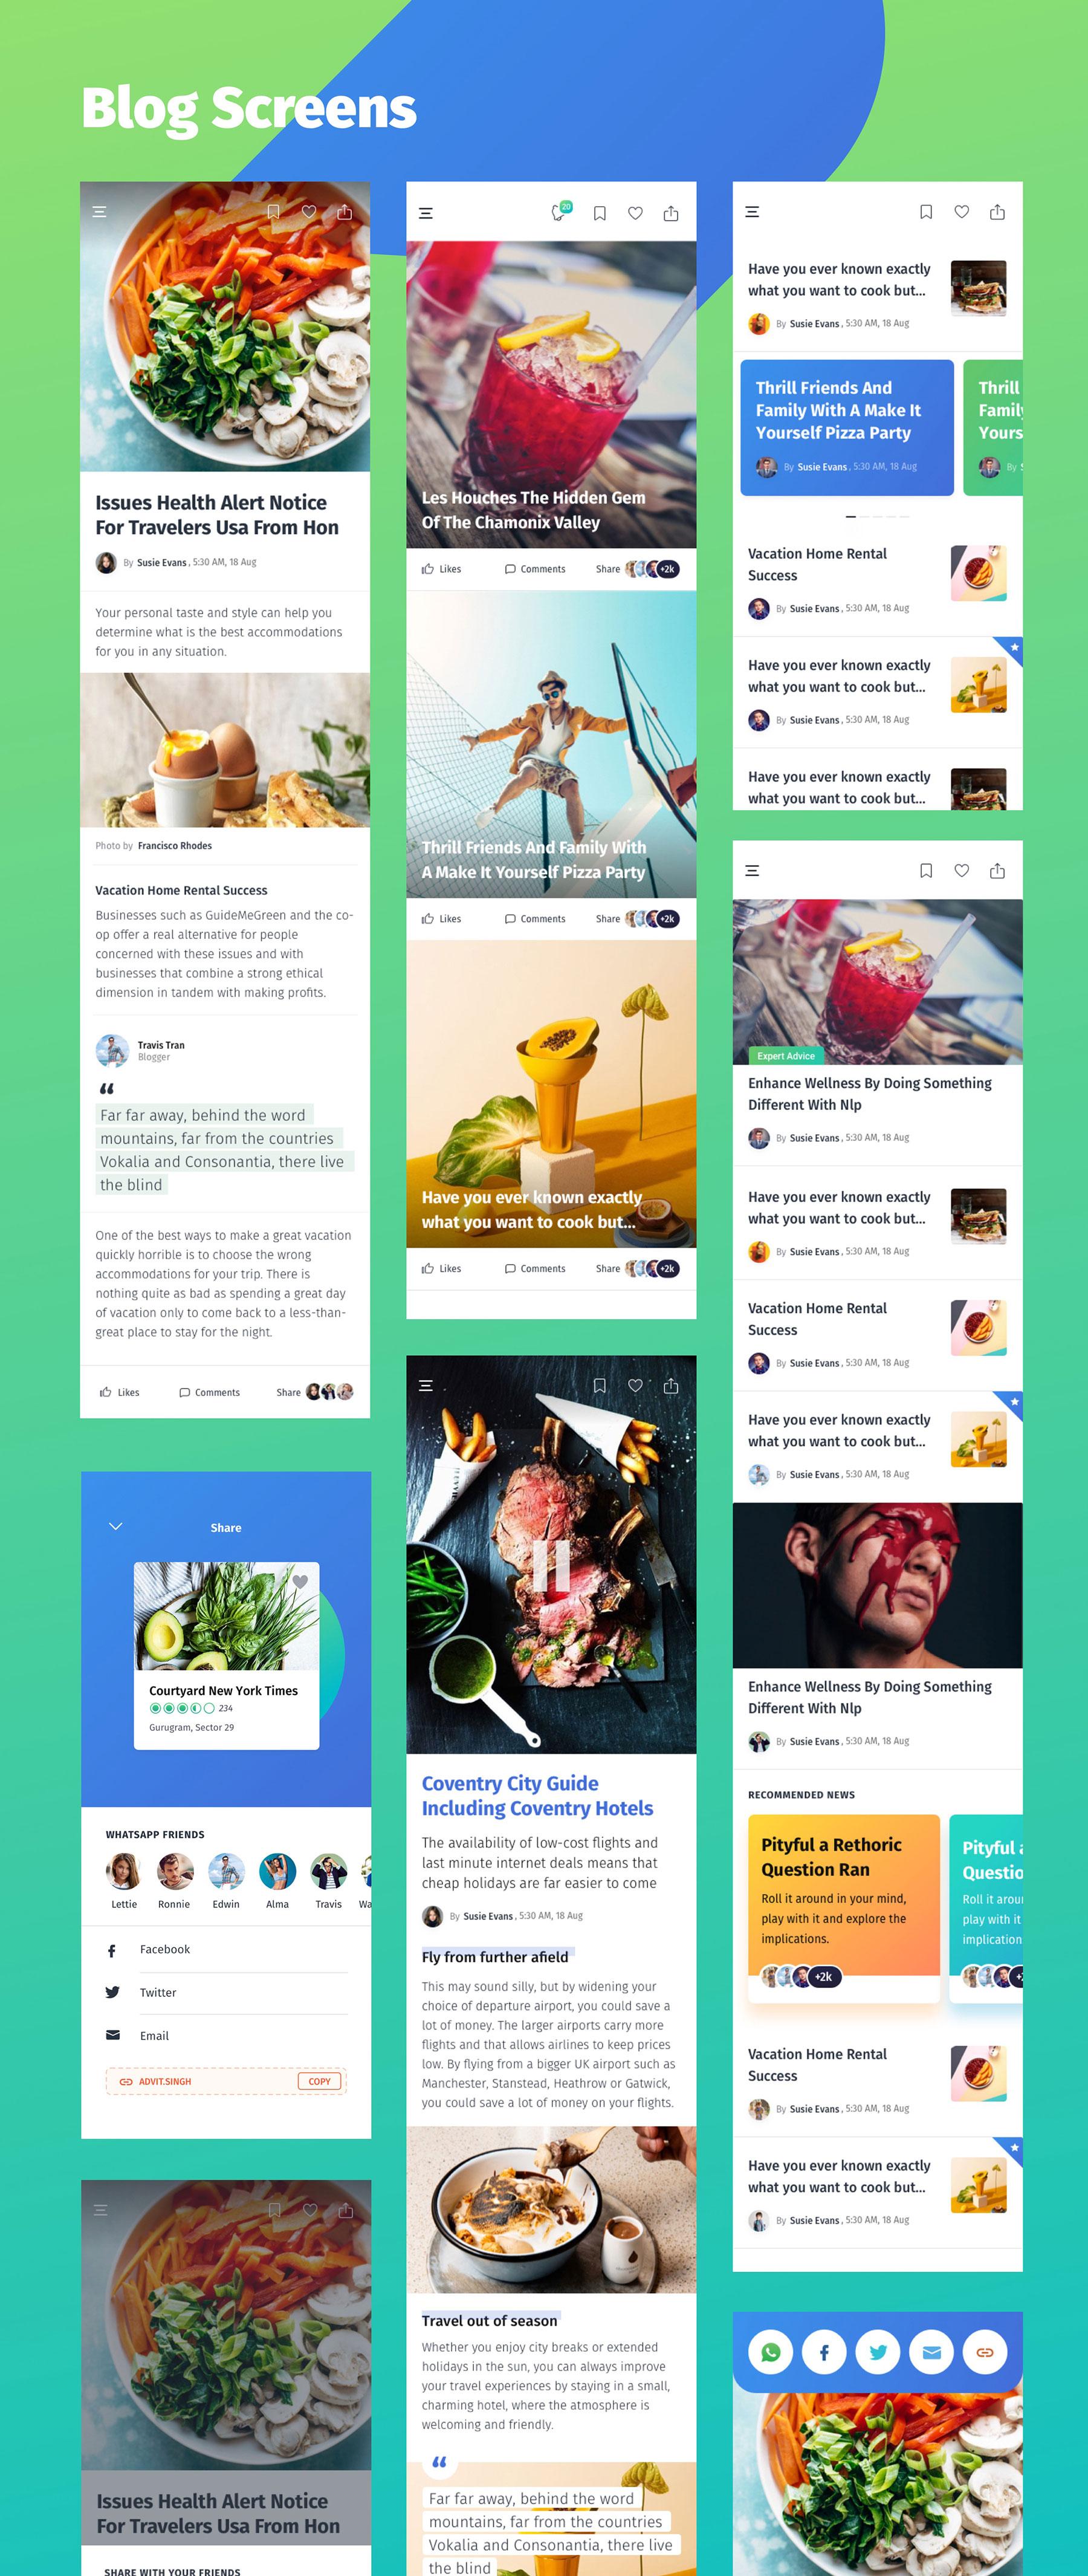 咖啡店酒店餐馆食品外卖APP应用程序UI界面设计套件 YumFood – Mobile App UI kit插图(8)